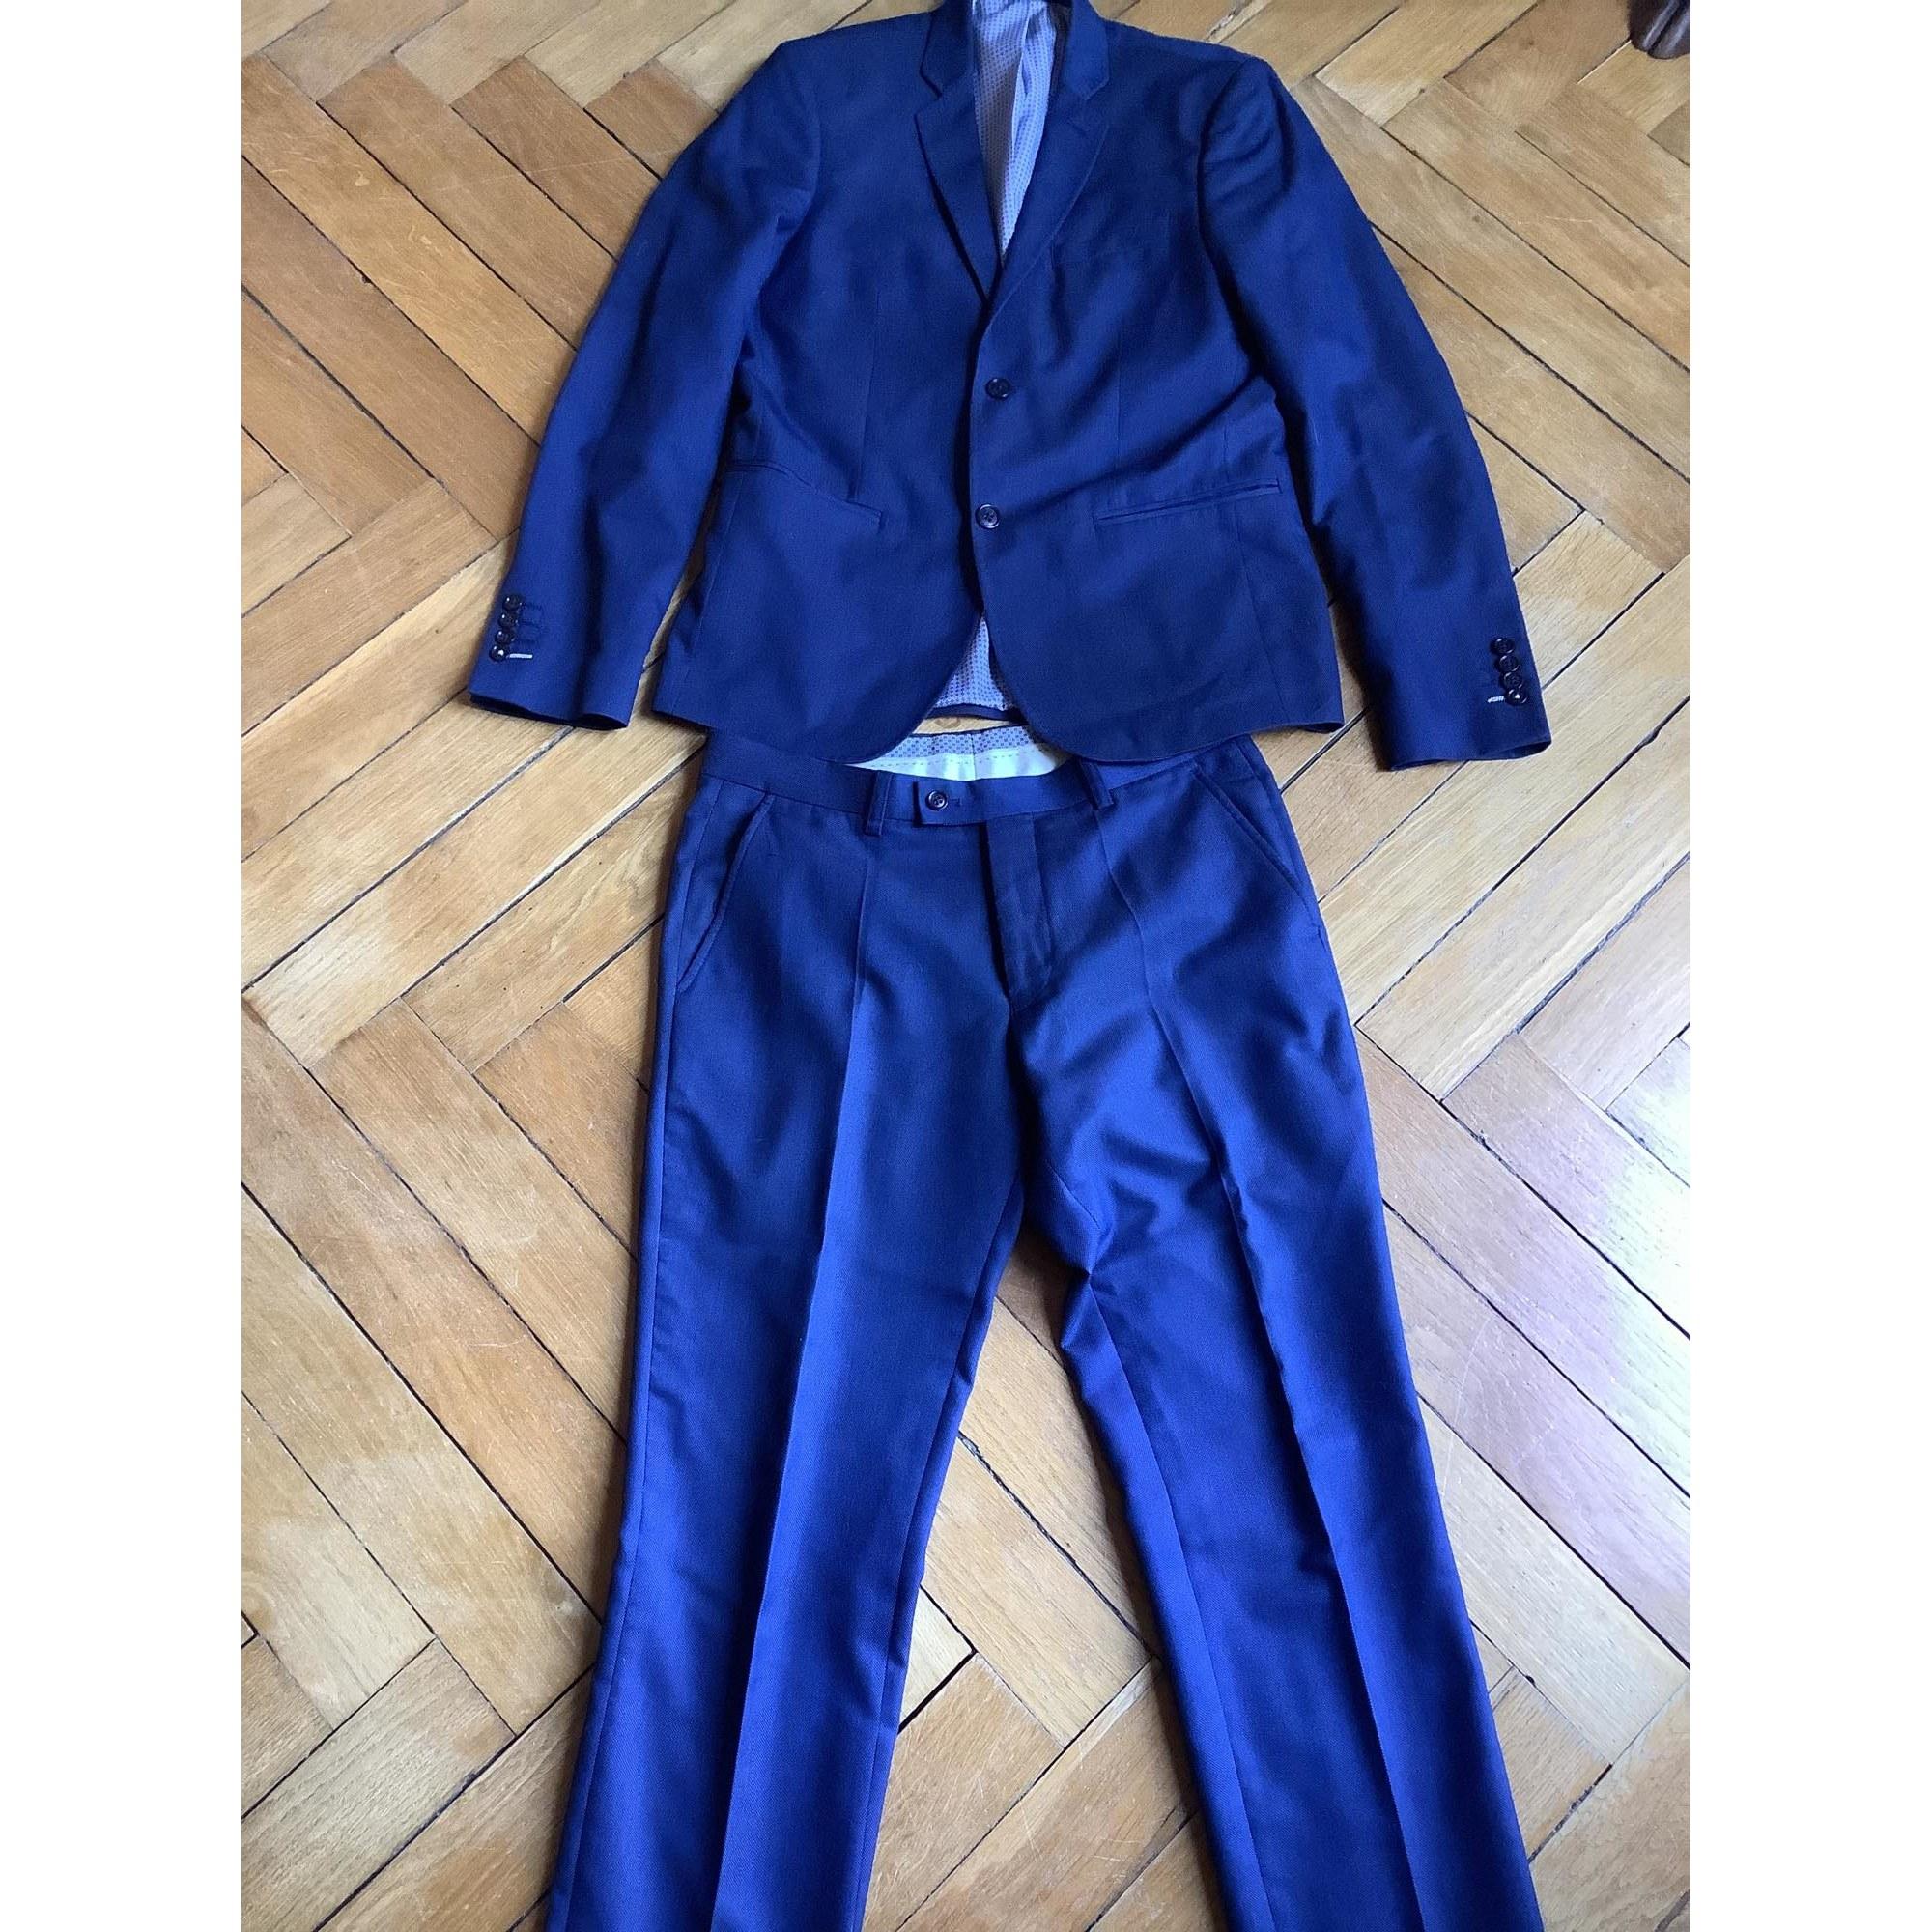 Costume complet DEVRED Bleu, bleu marine, bleu turquoise